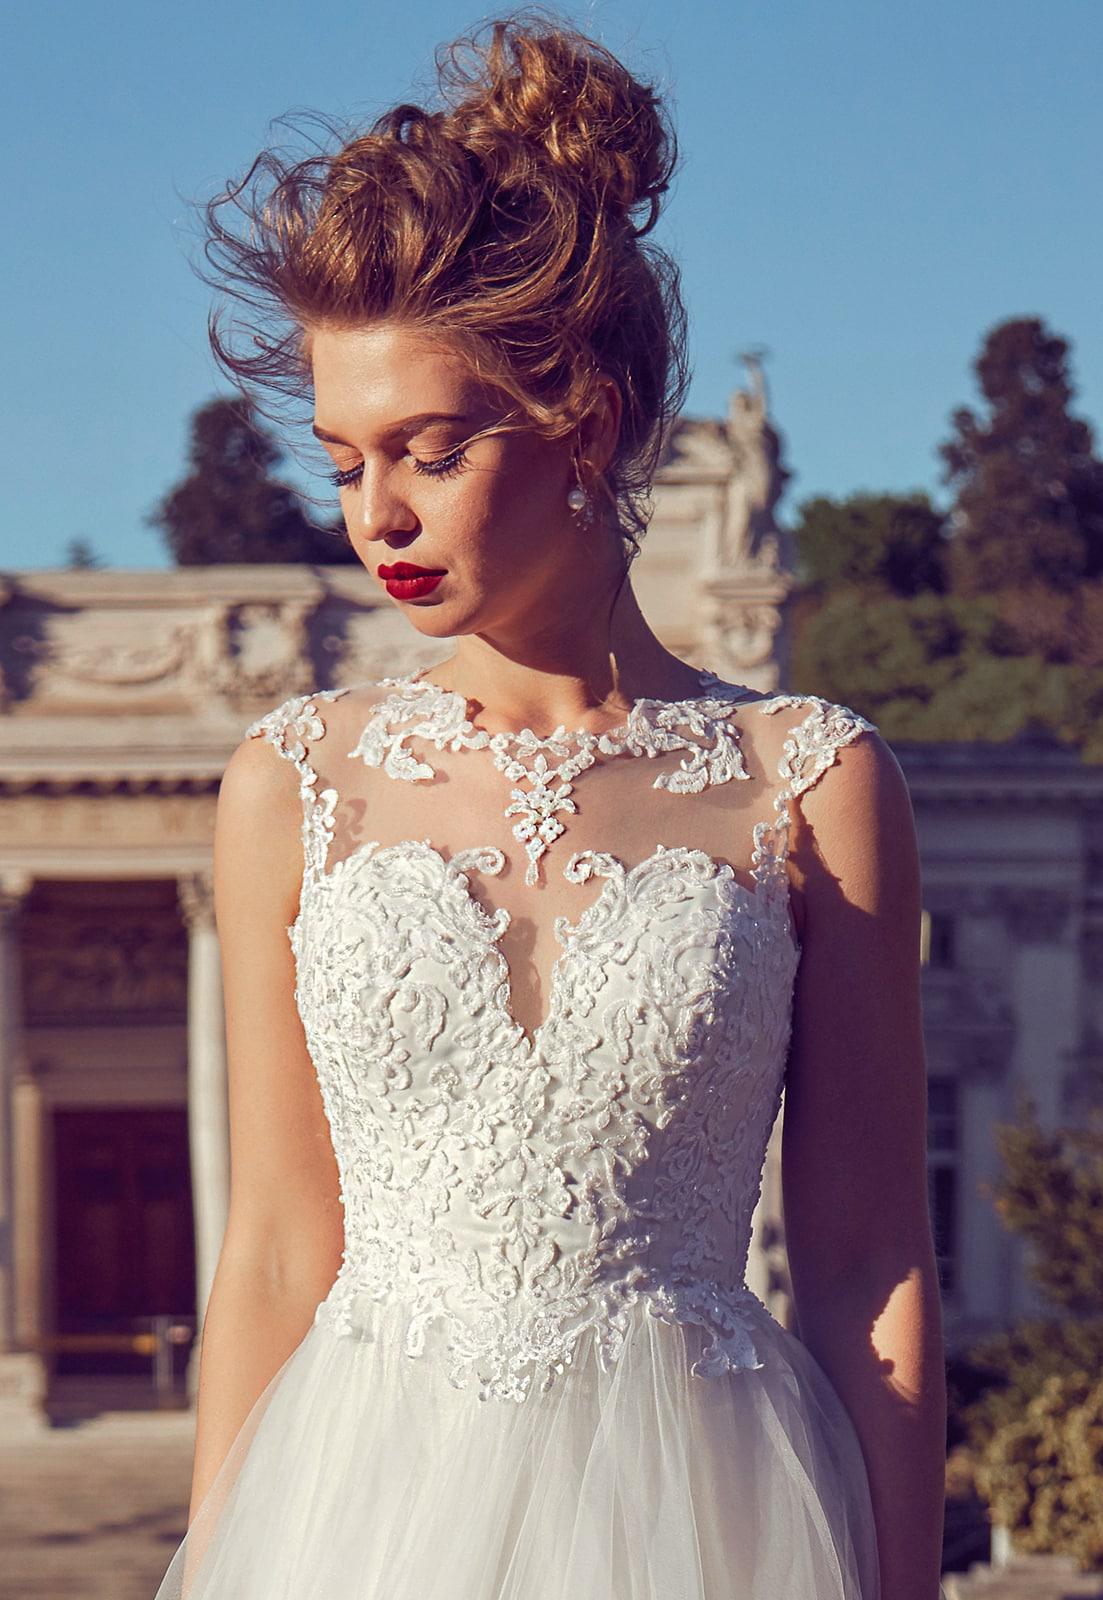 Natalie Model - Colectia Roma - Adora Sposa (3)